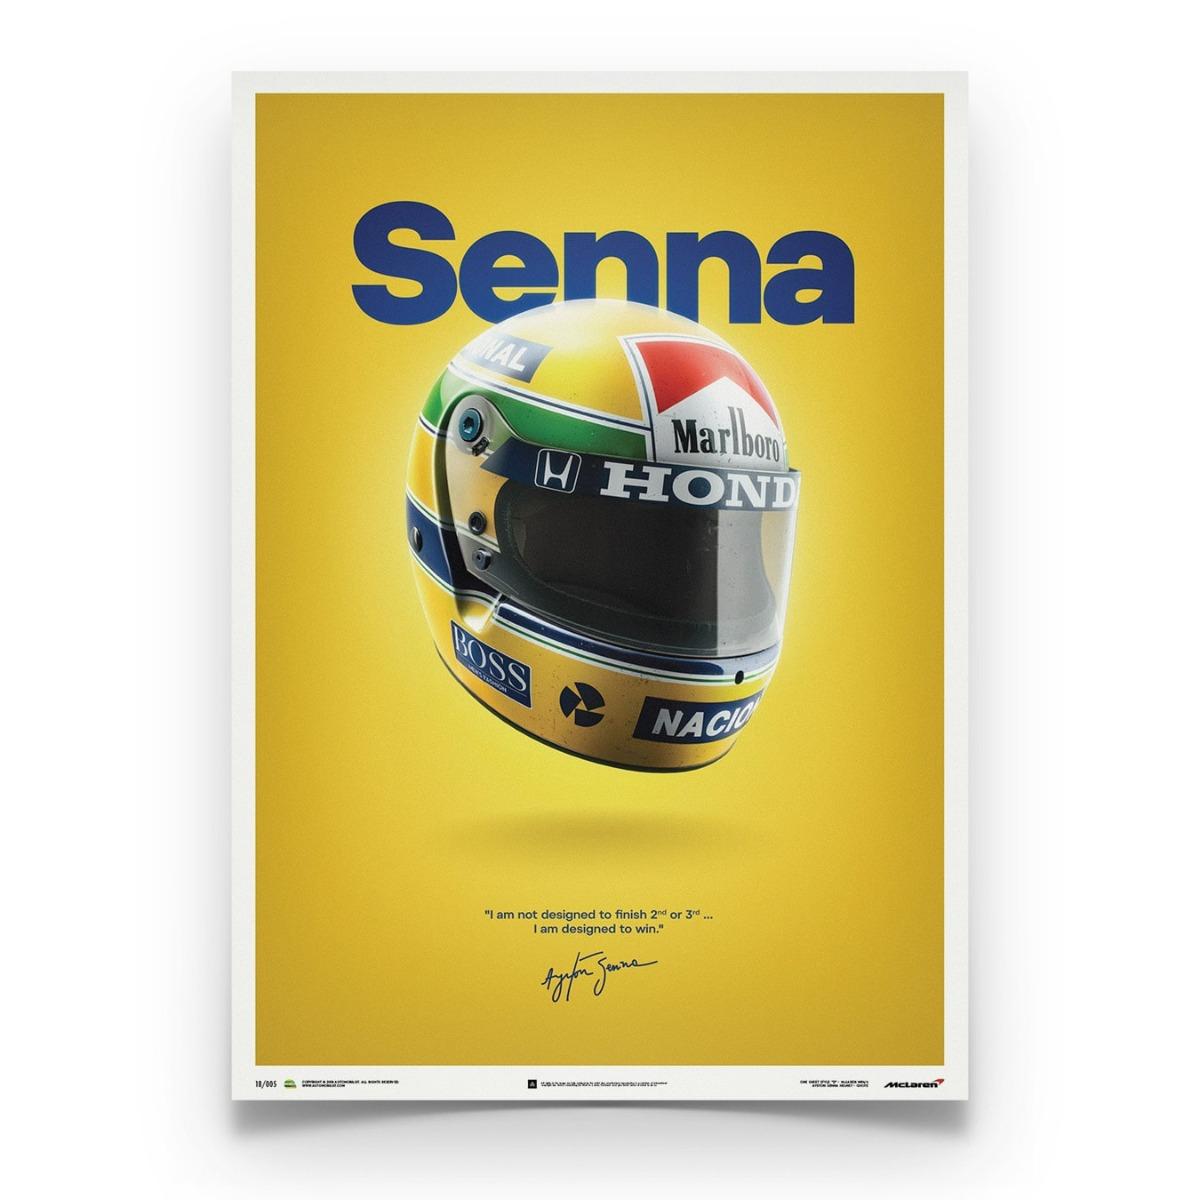 McLaren MP4/4 - Ayrton Senna - Helmet - San Marino GP - 1988